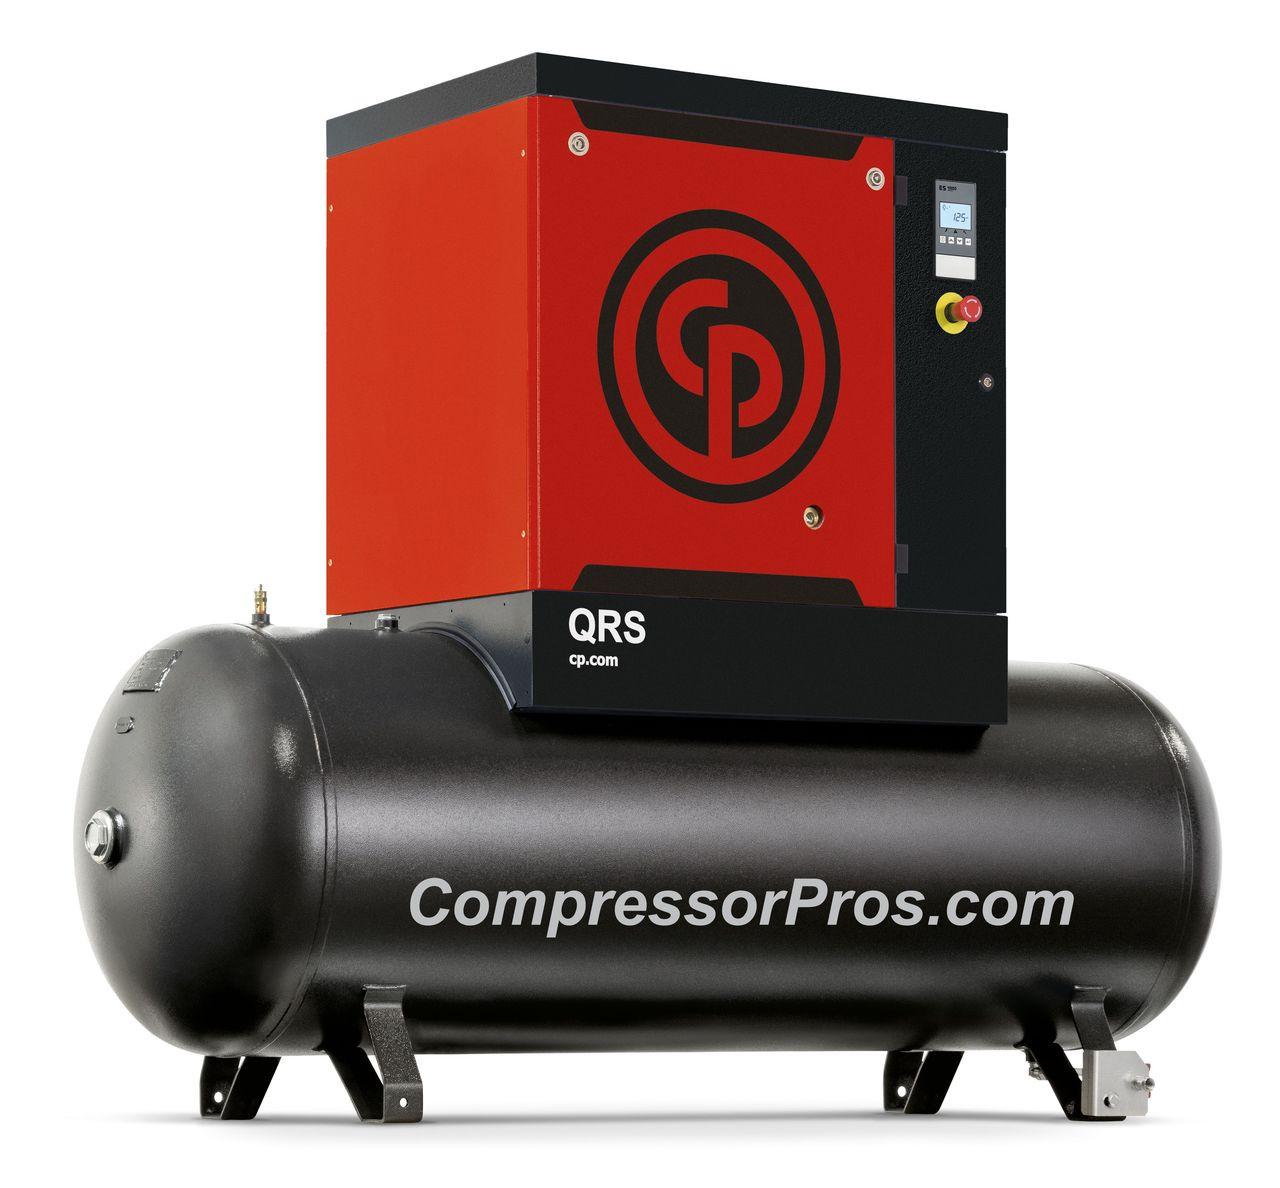 Chicago Pneumatic QRS10HP 150 10 HP 150 psi 132 Gallon Rotary Screw Air Compressor